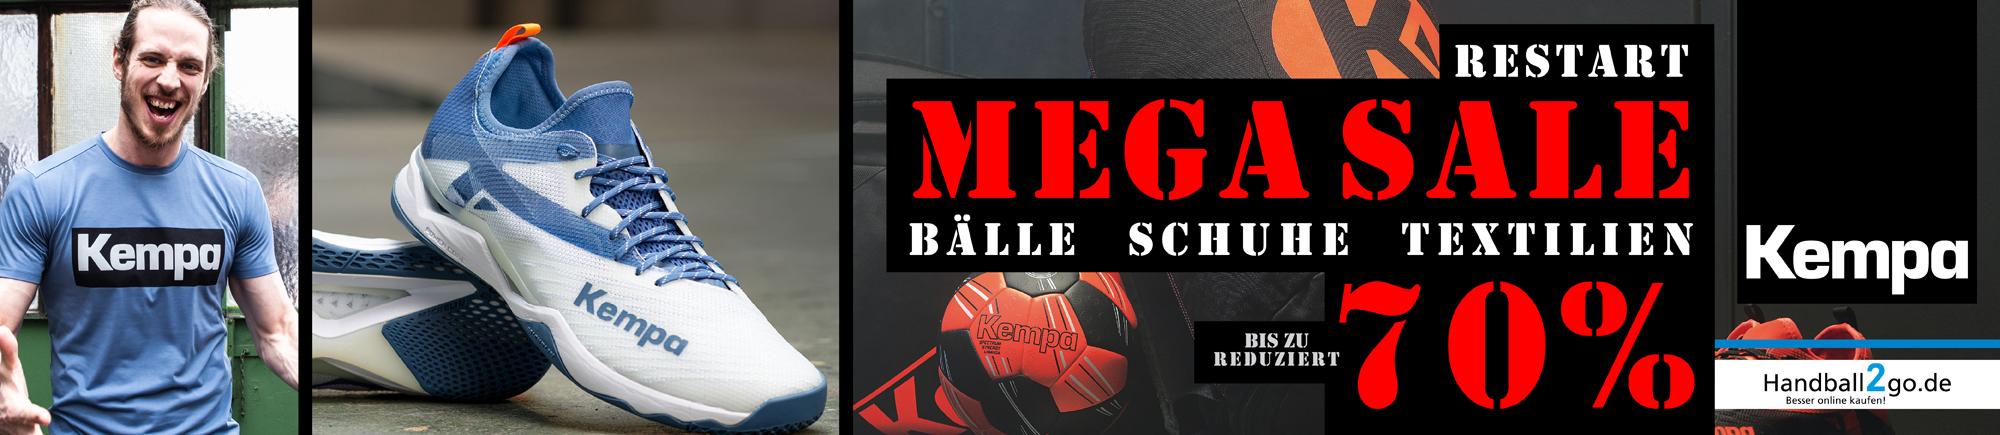 Handball Mega Sale